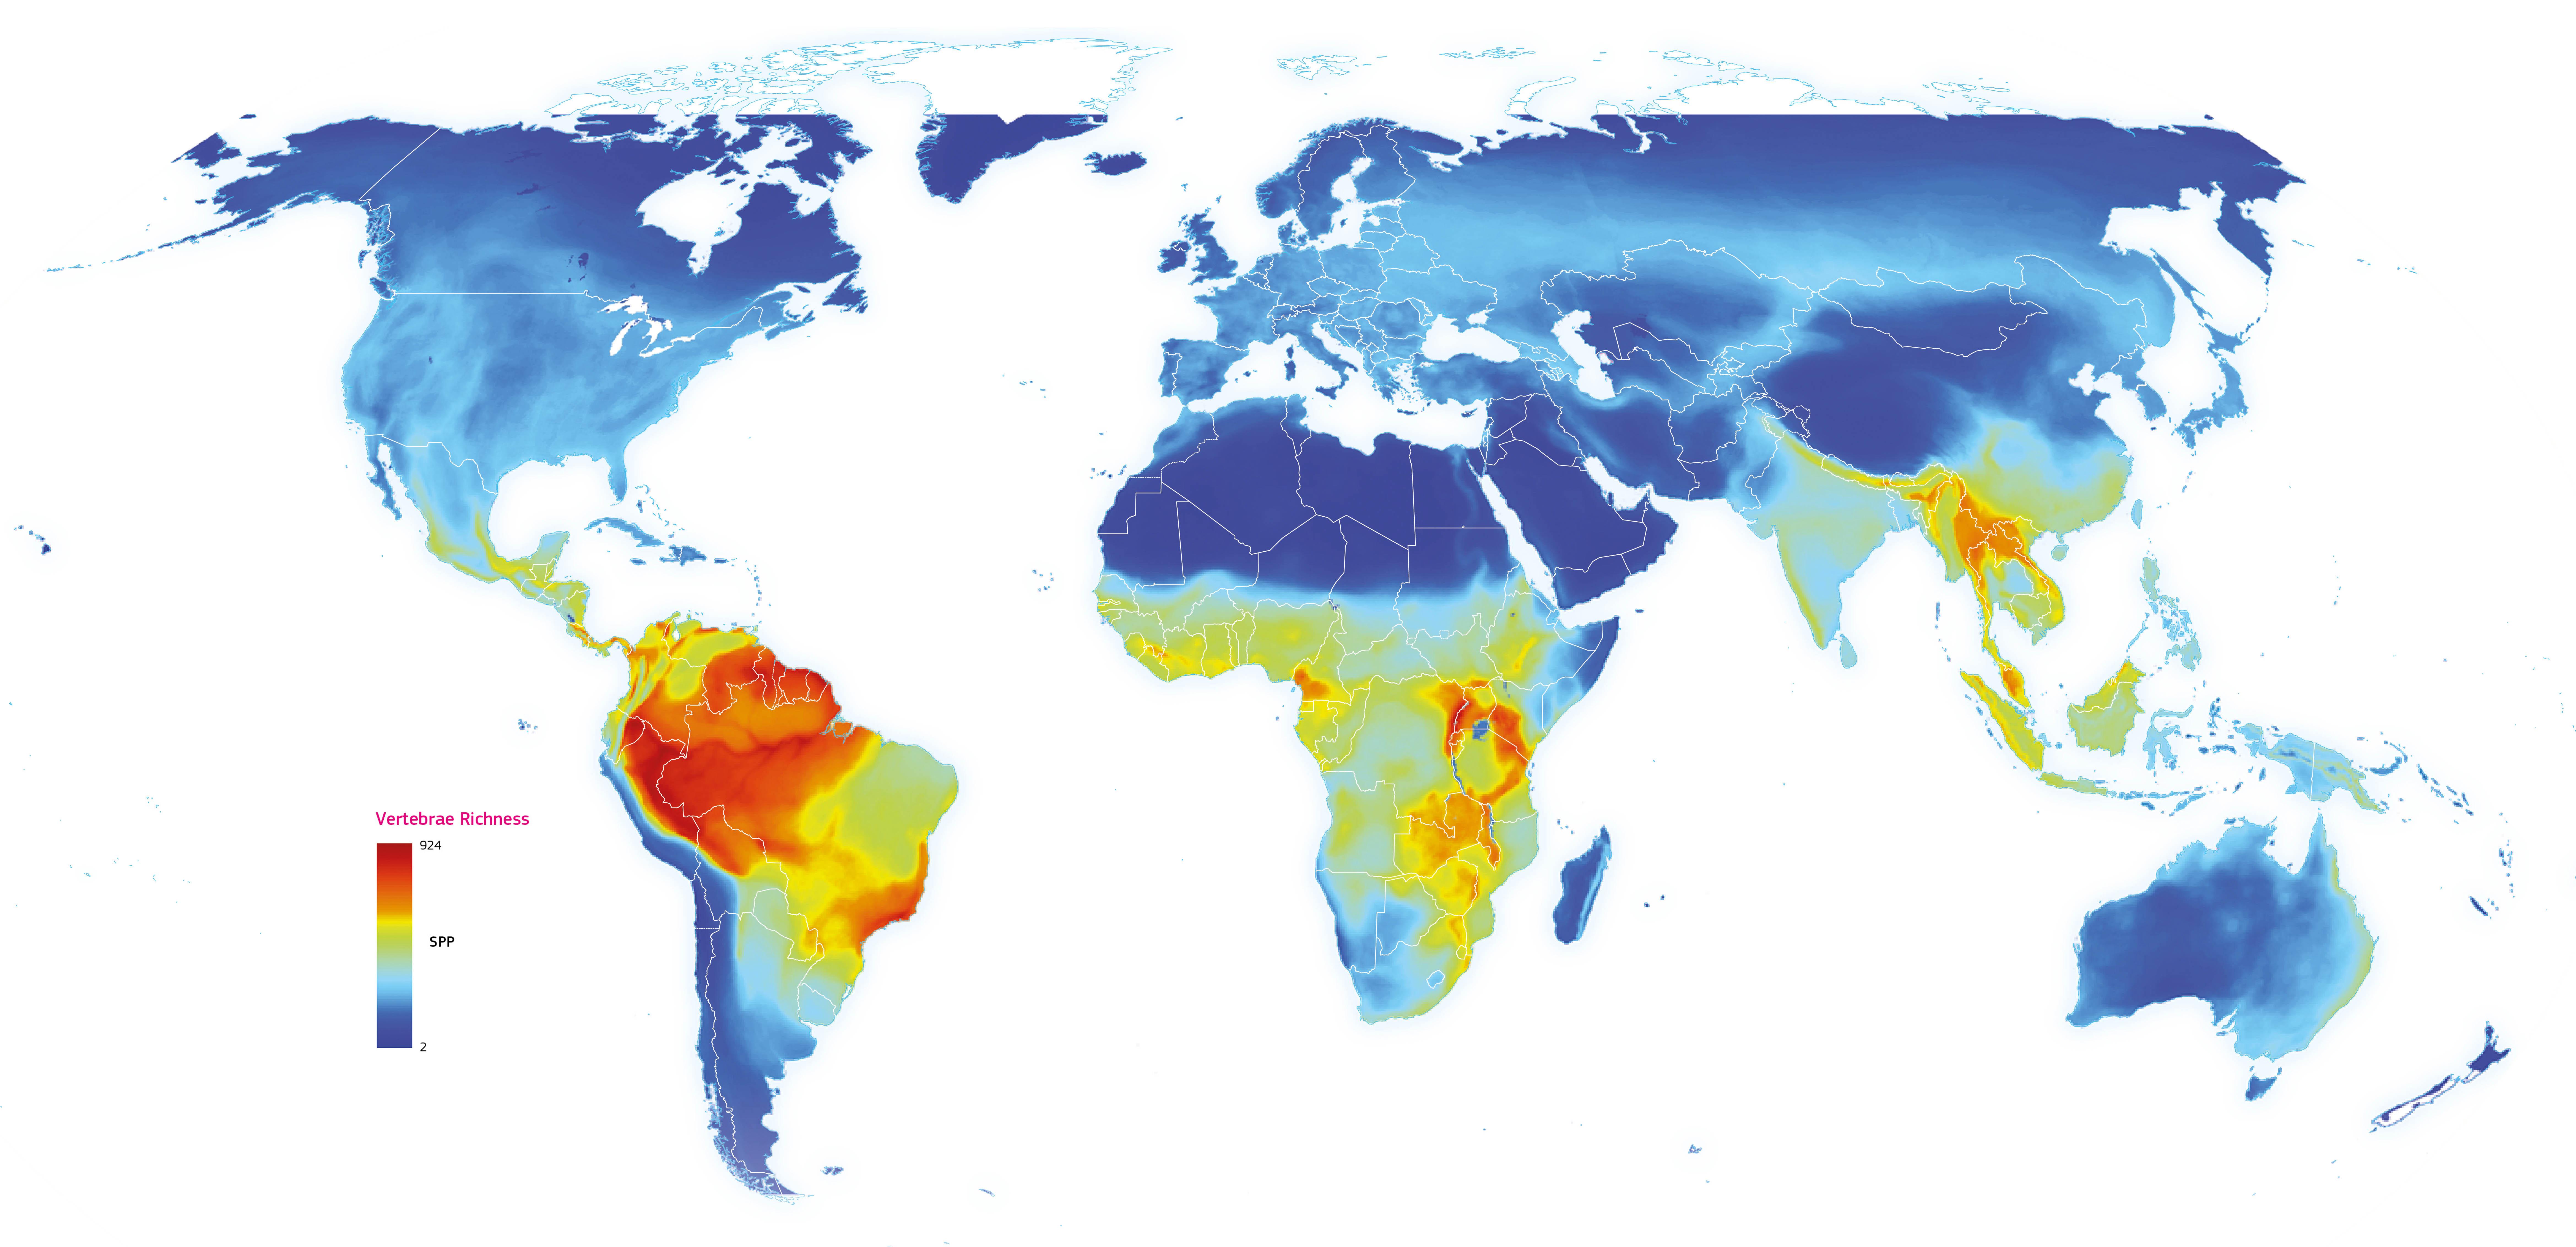 Wad World Atlas Of Desertification